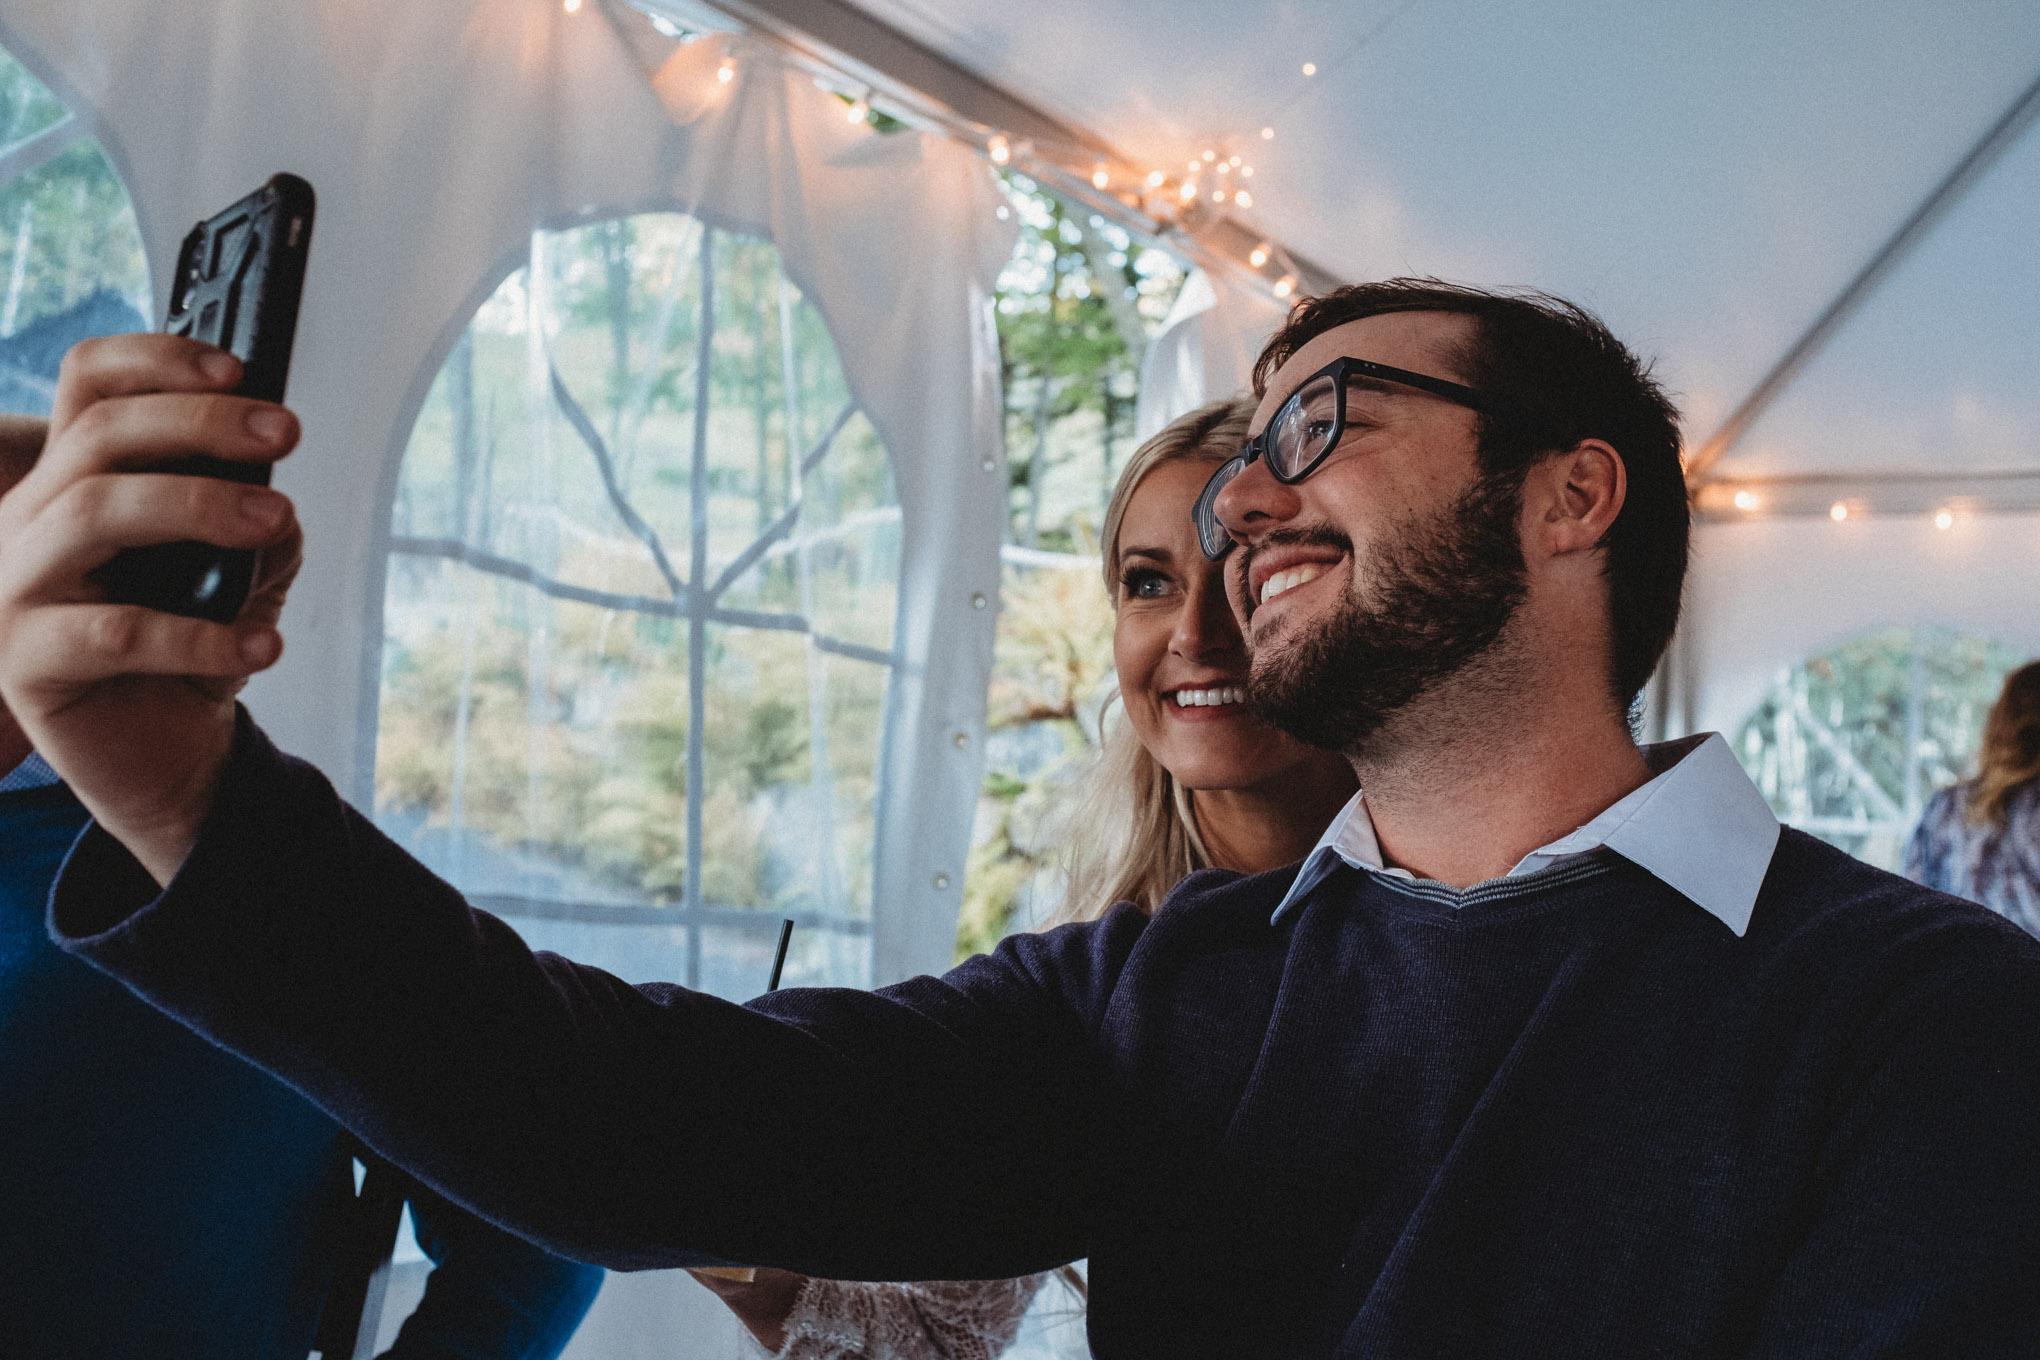 Austin Shea and the bride, Jodi Hogan, smile and take a selfie together.